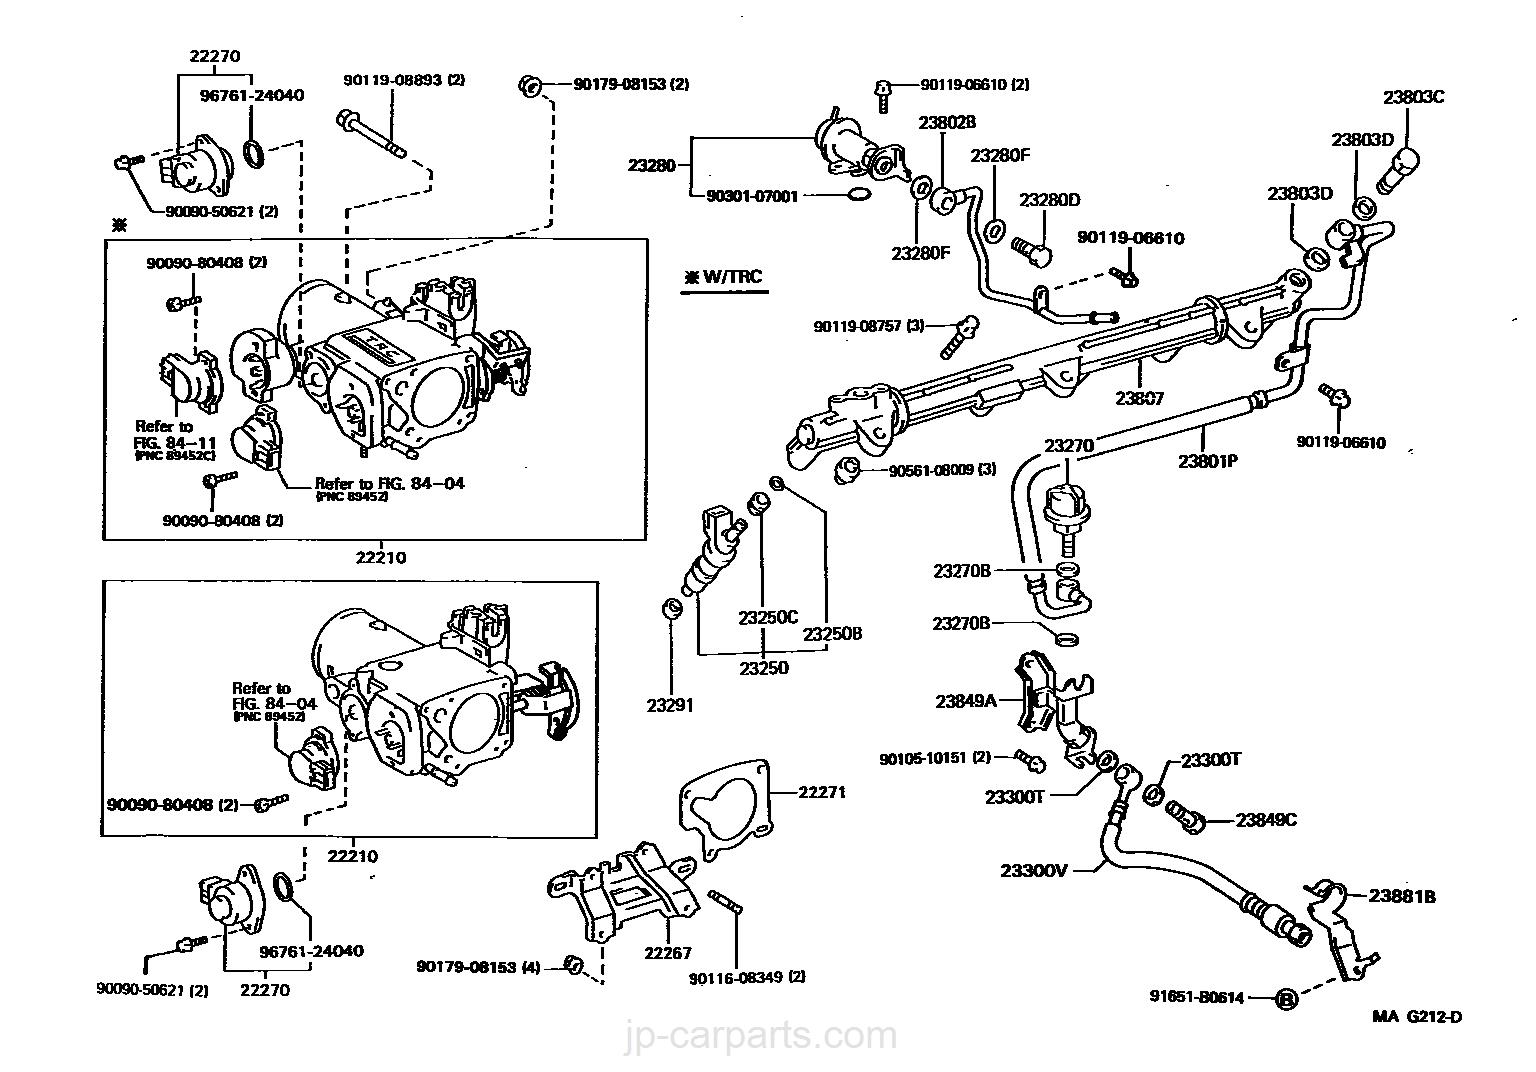 FUEL INJECTION SYSTEM / toyota | part list|JP-CarParts com